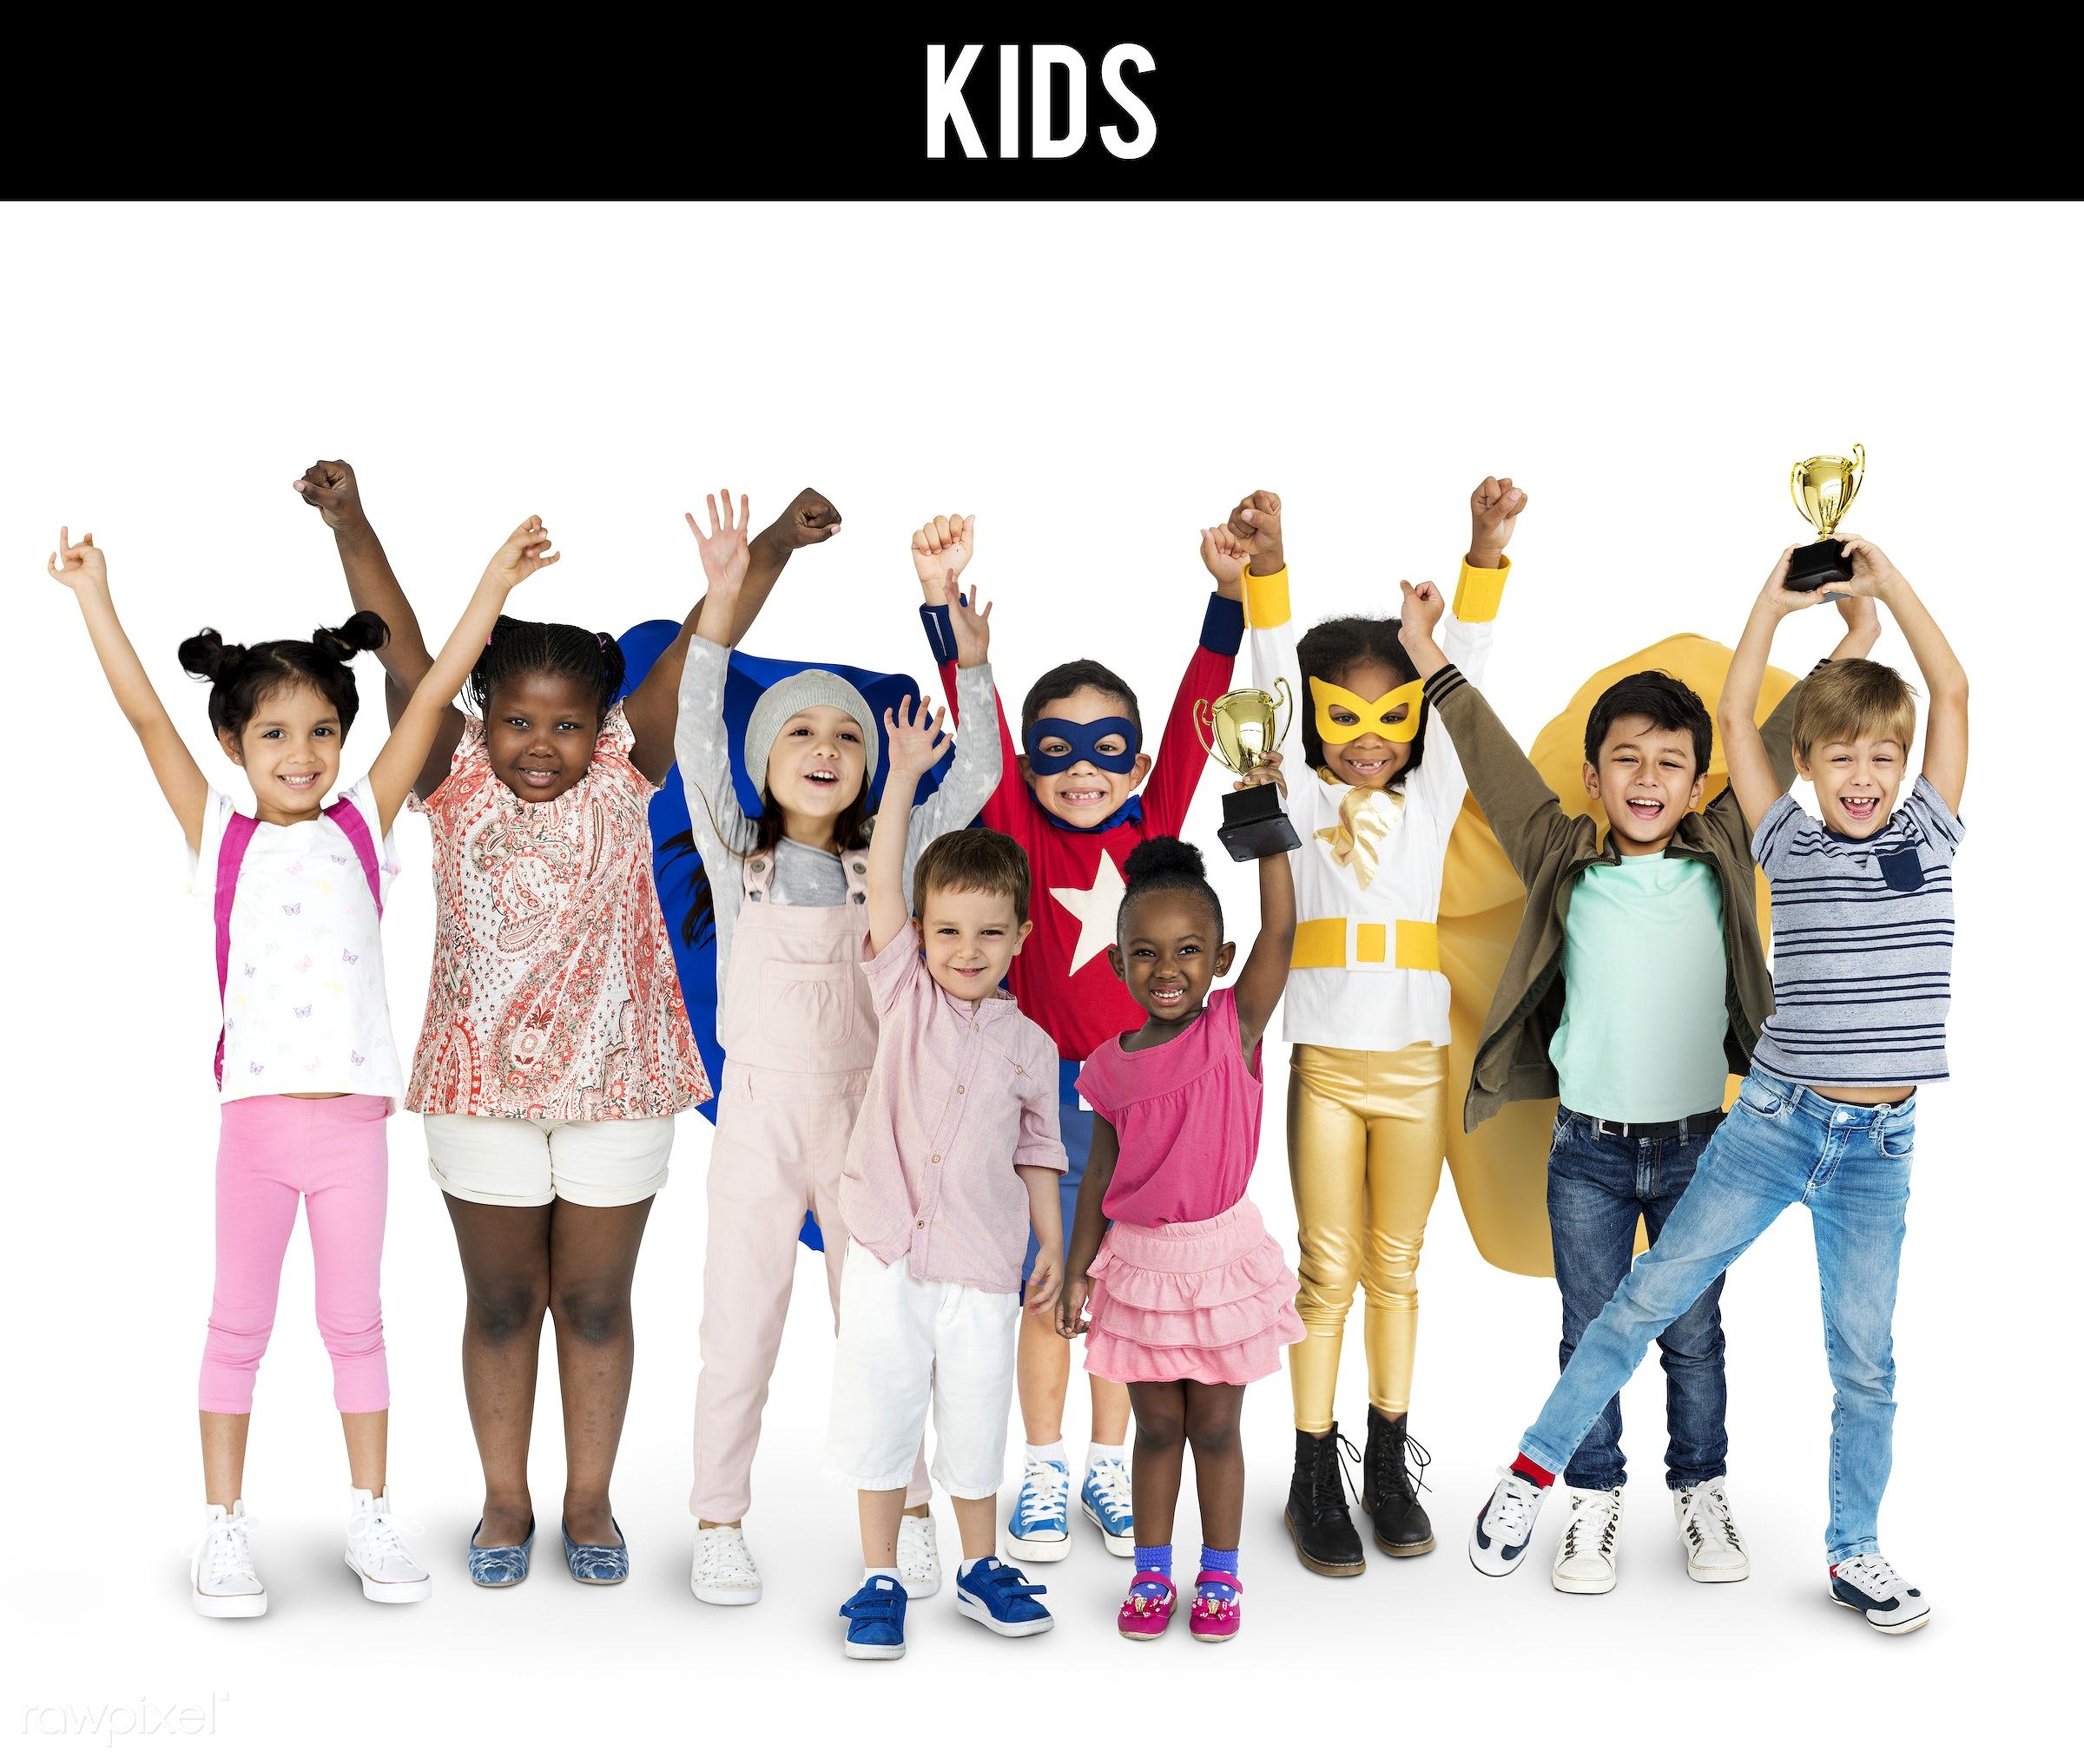 Diverse people set - studio, person, little, winner, people, together, kid, teamwork, friends, friendship, childhood,...